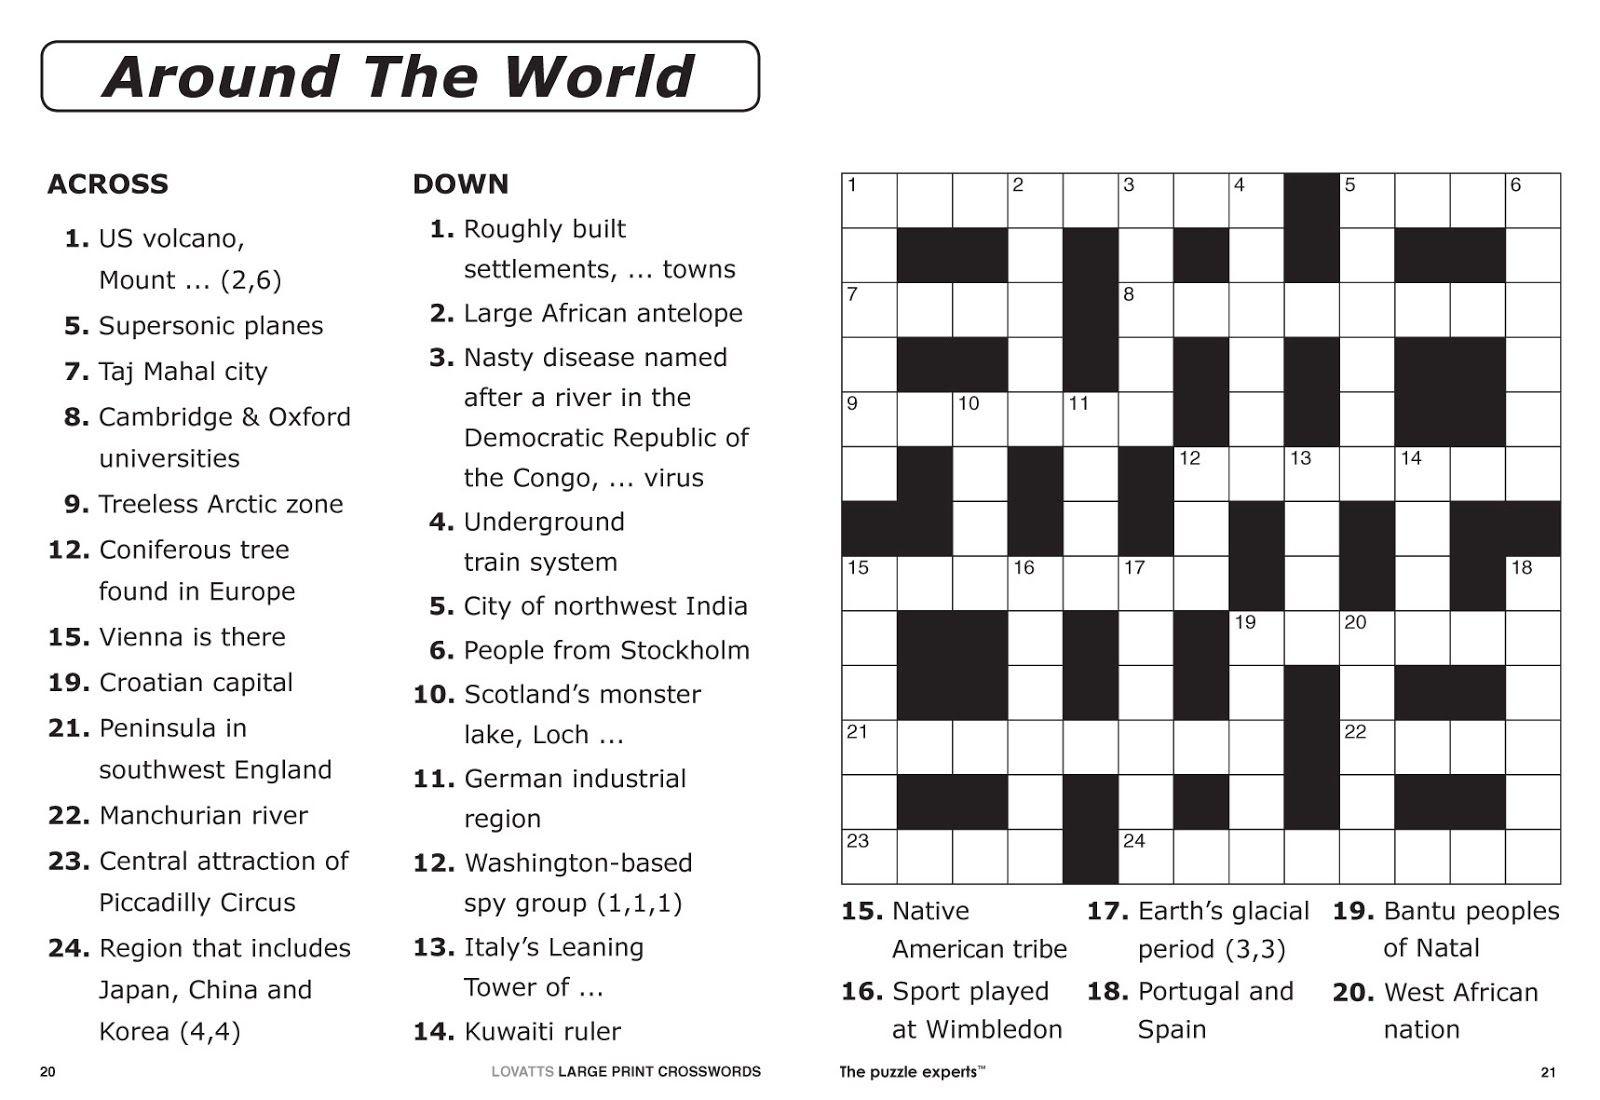 Free Printable Large Print Crossword Puzzles | M3U8 - Printable Crosswords For 6 Year Olds